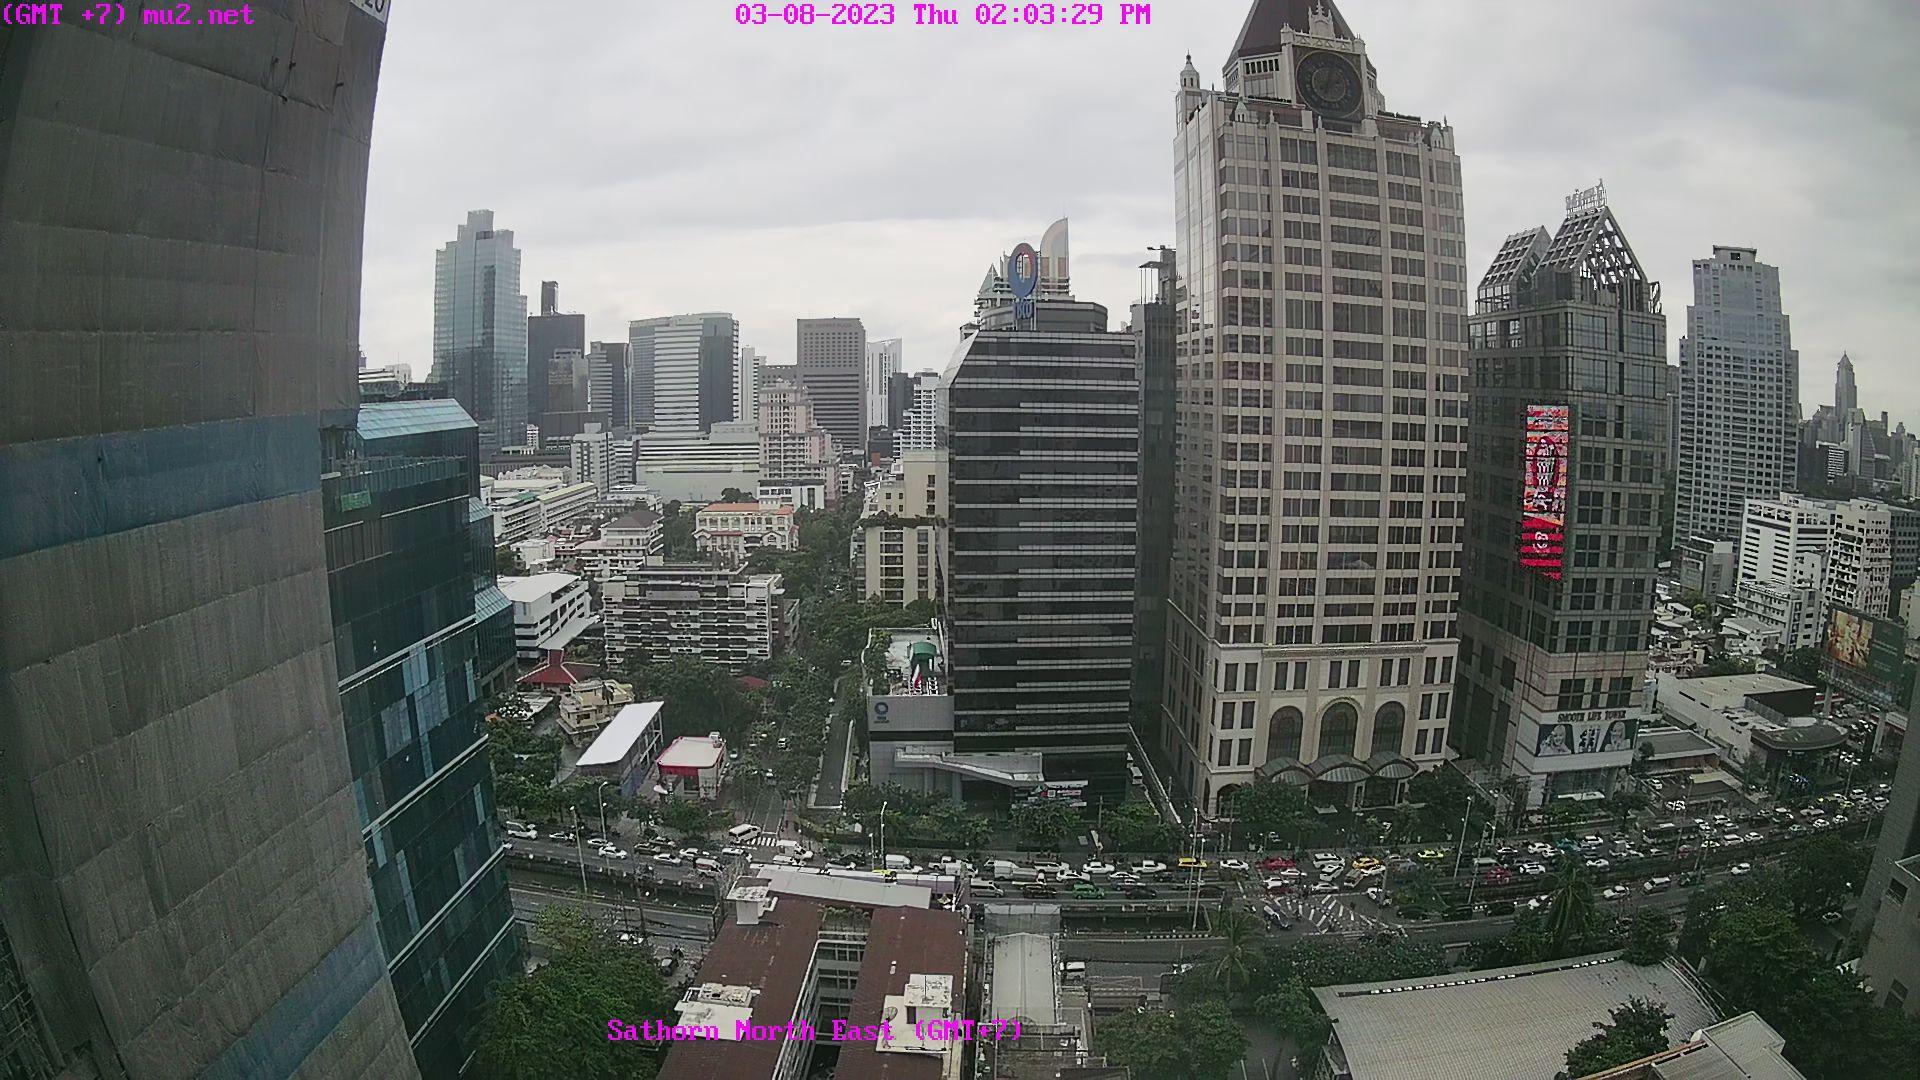 Bangkok Mon. 14:09